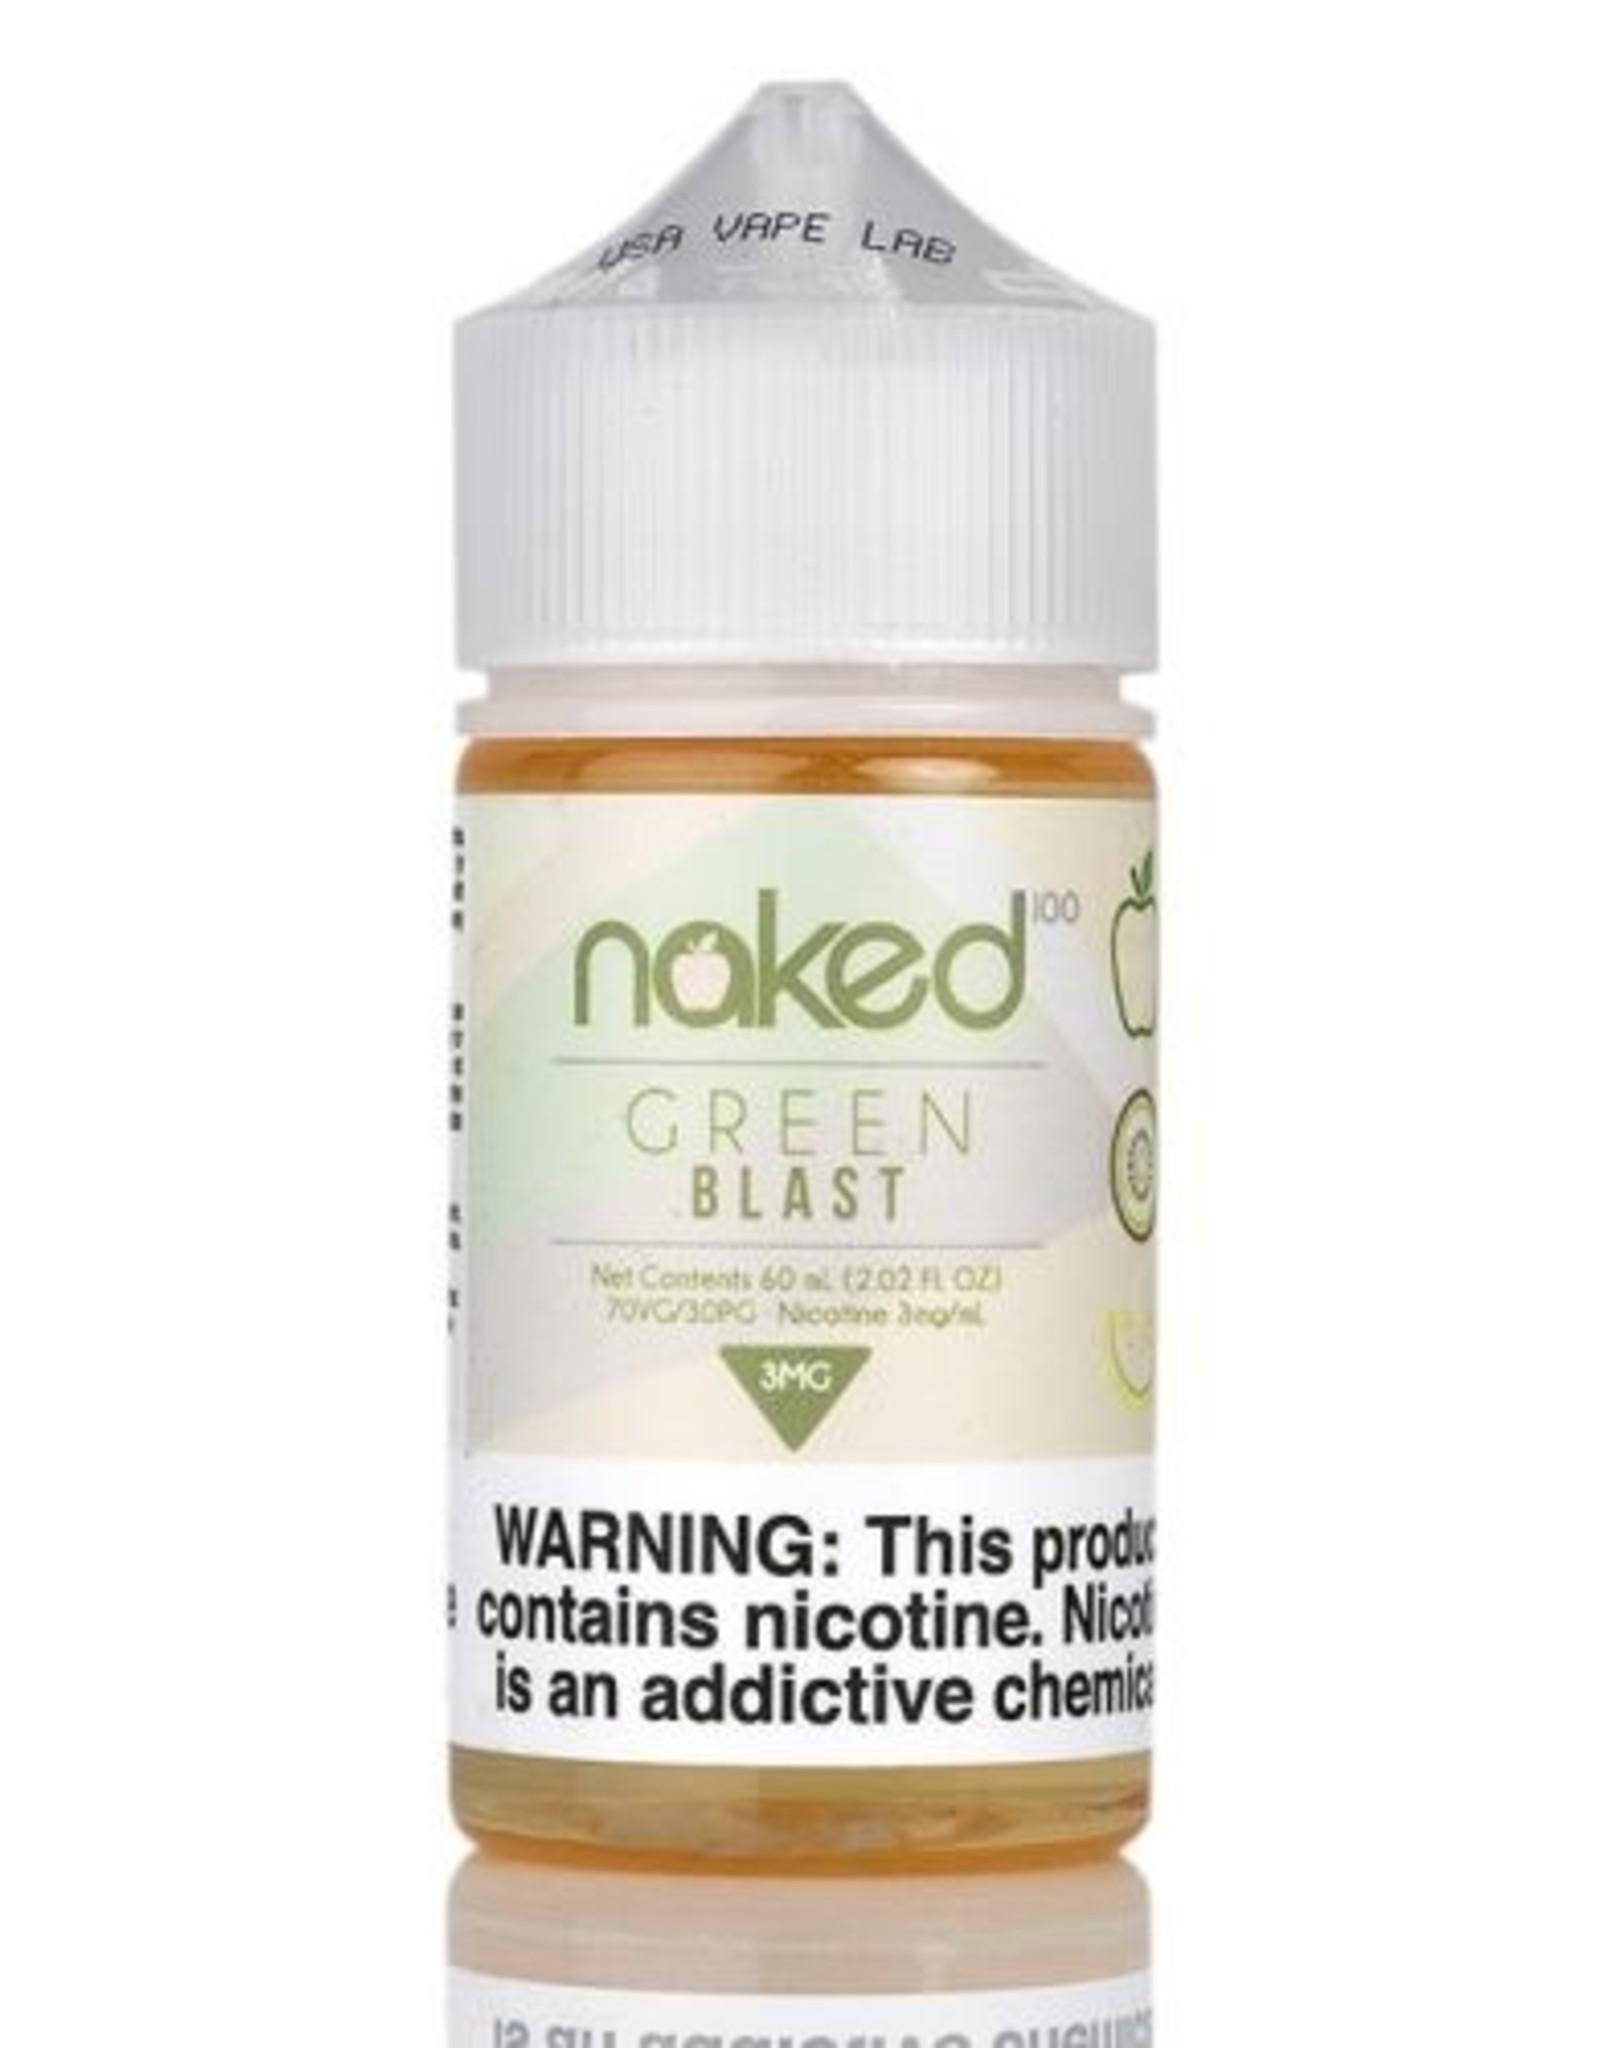 Naked 100 Melon Kiwi By Naked 100 (Green Blast)